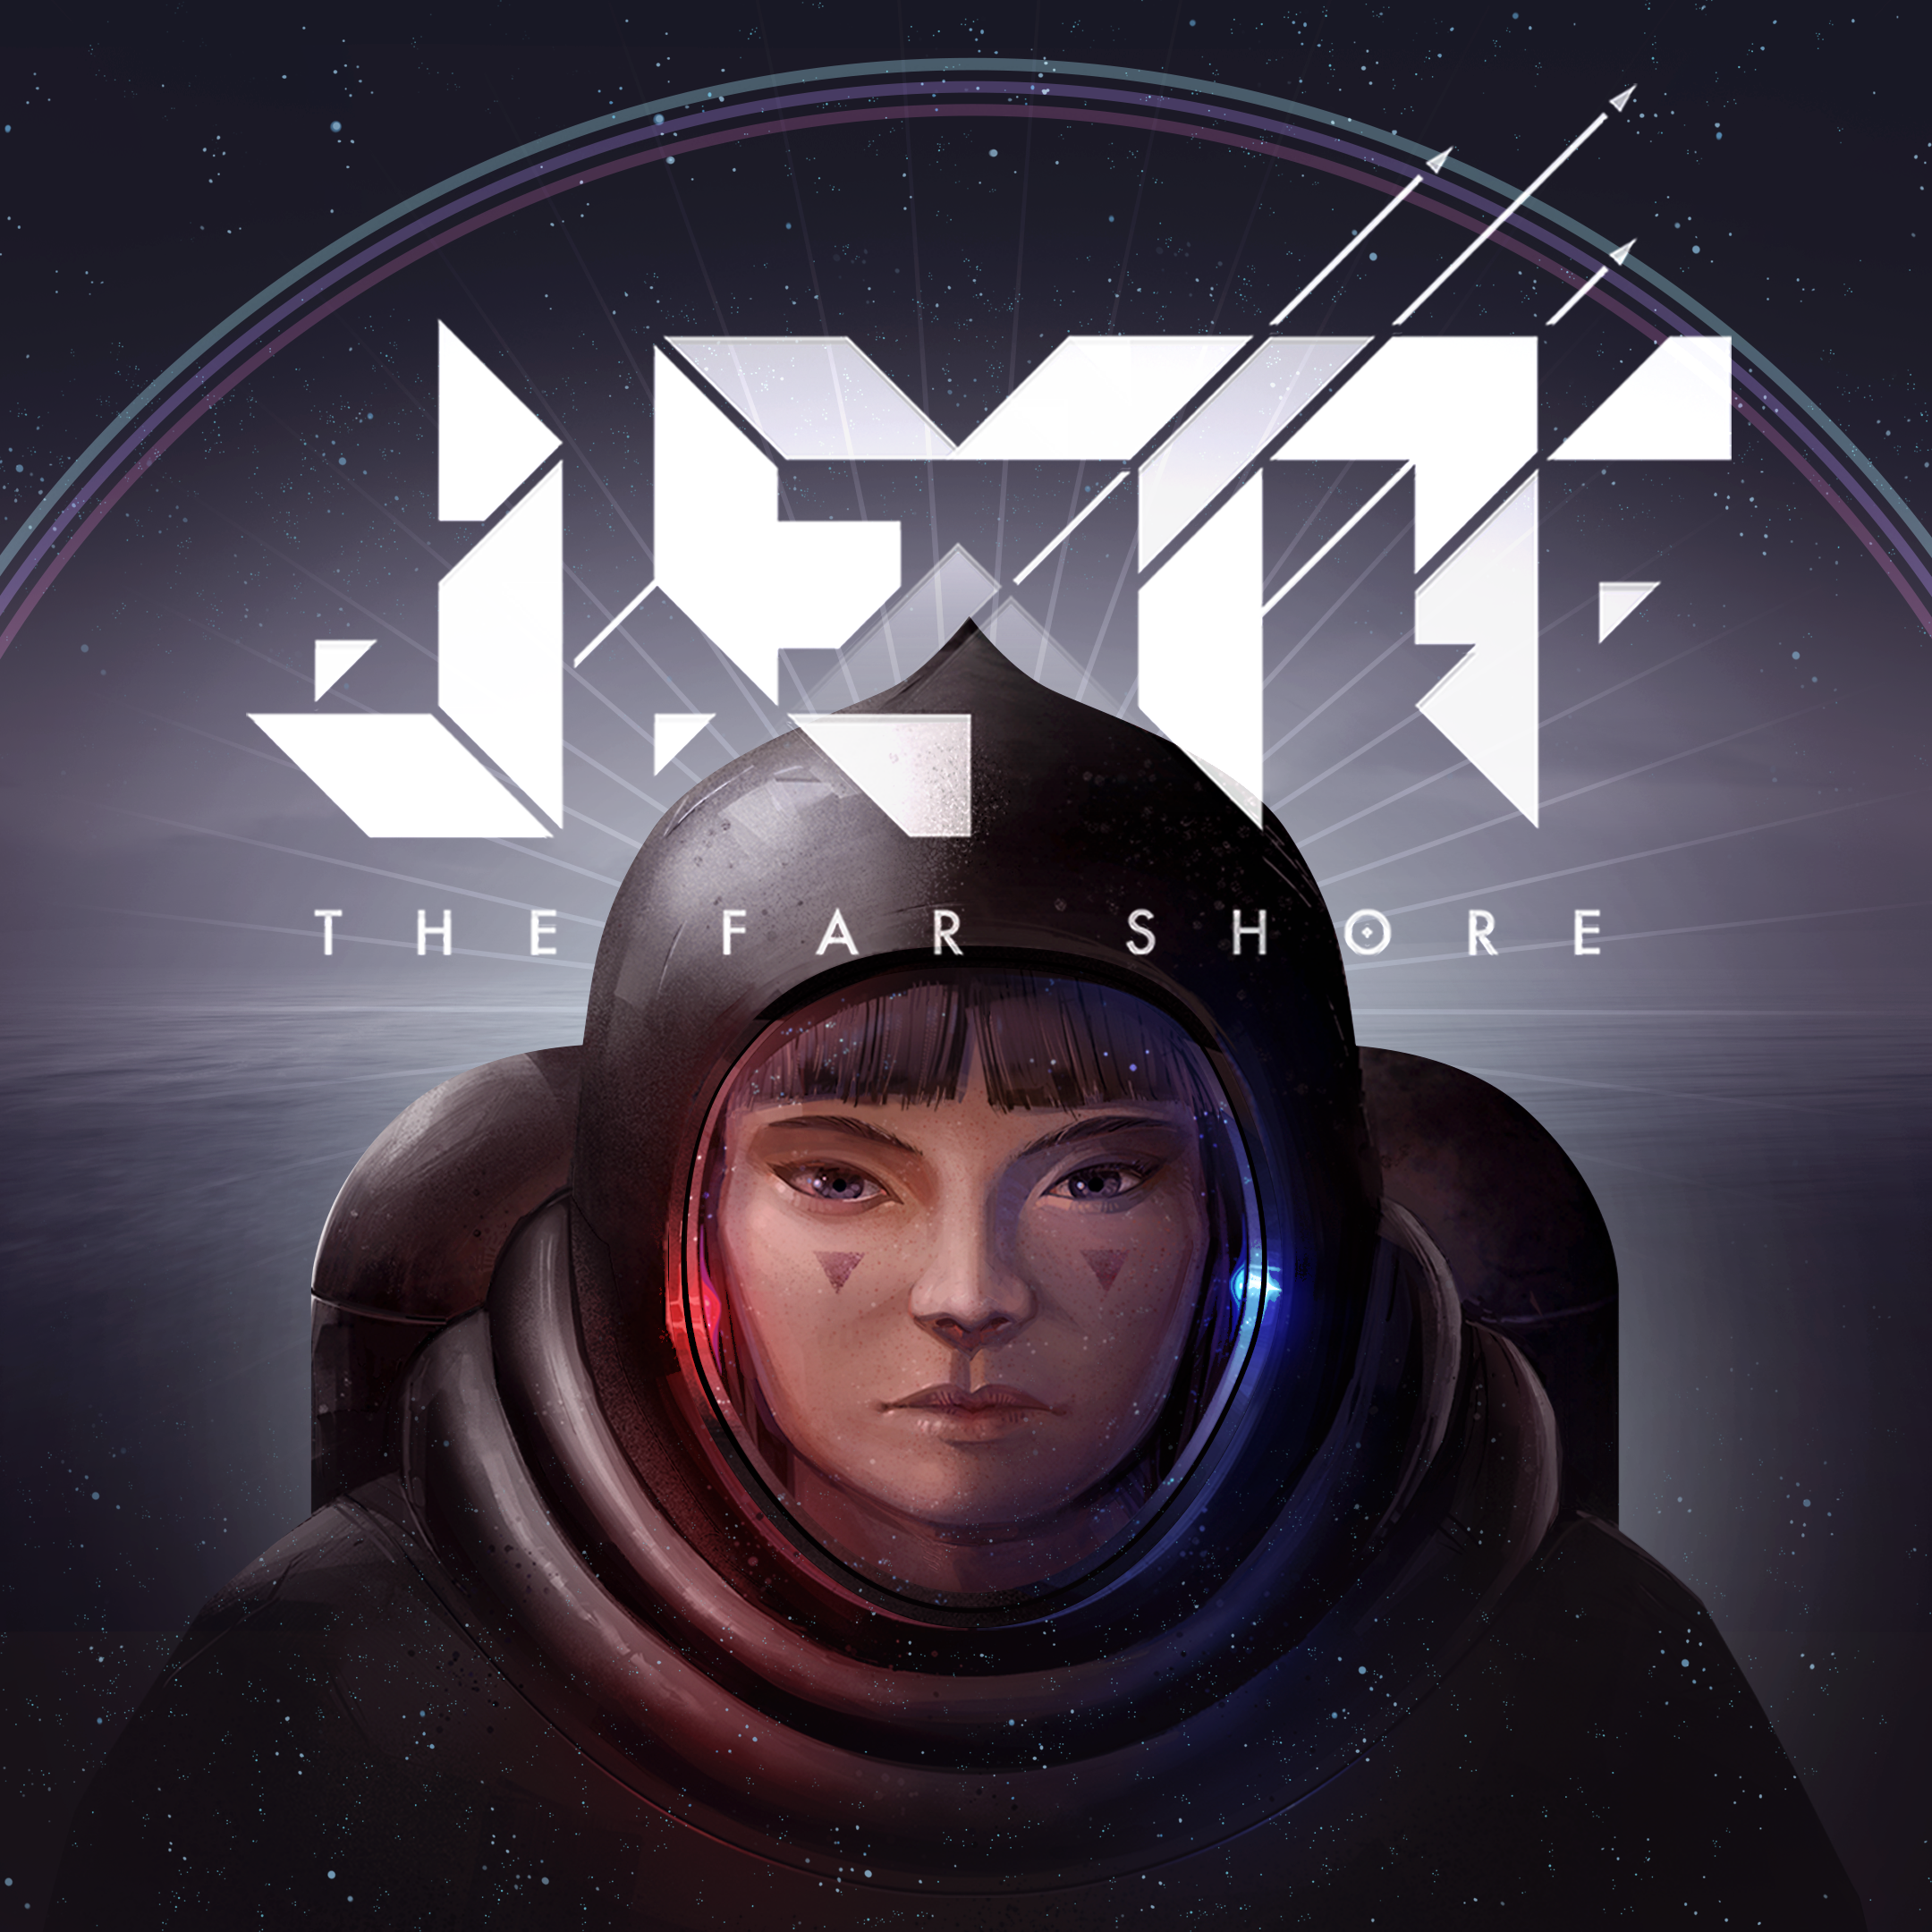 JETT : The Far Shore